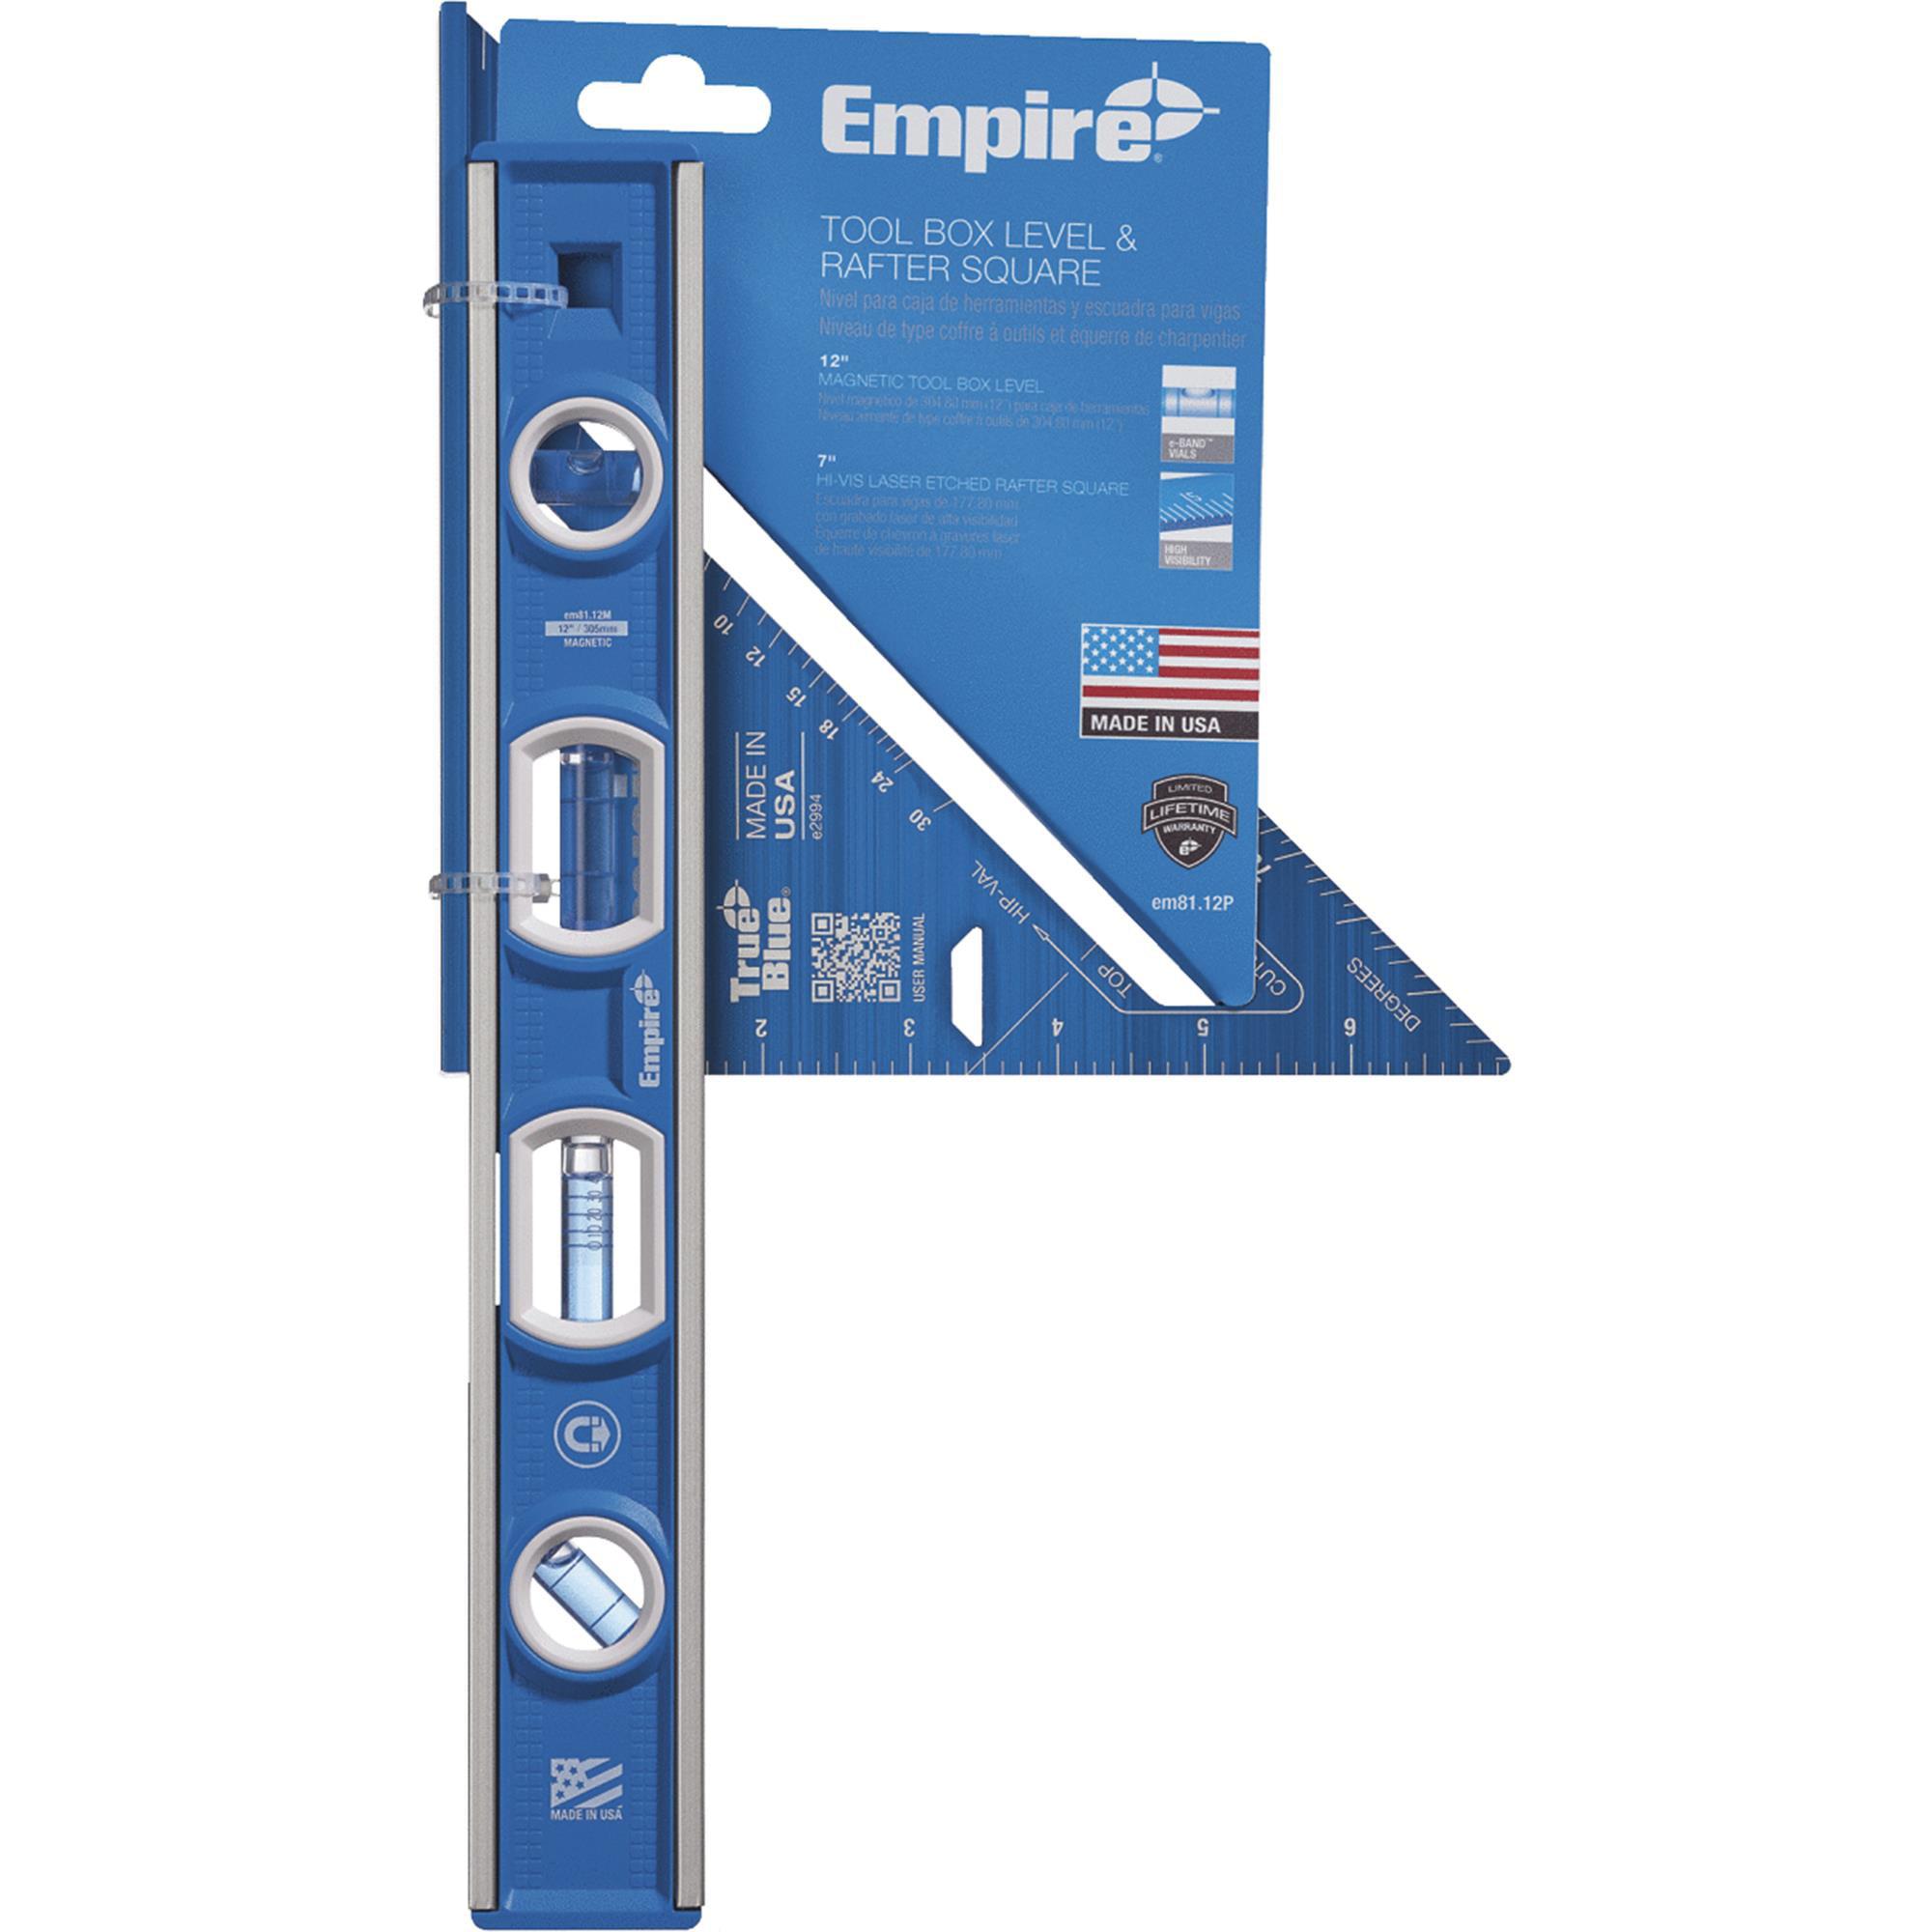 Empire True Blue Torpedo Level & Rafter Square Combo Tool Set